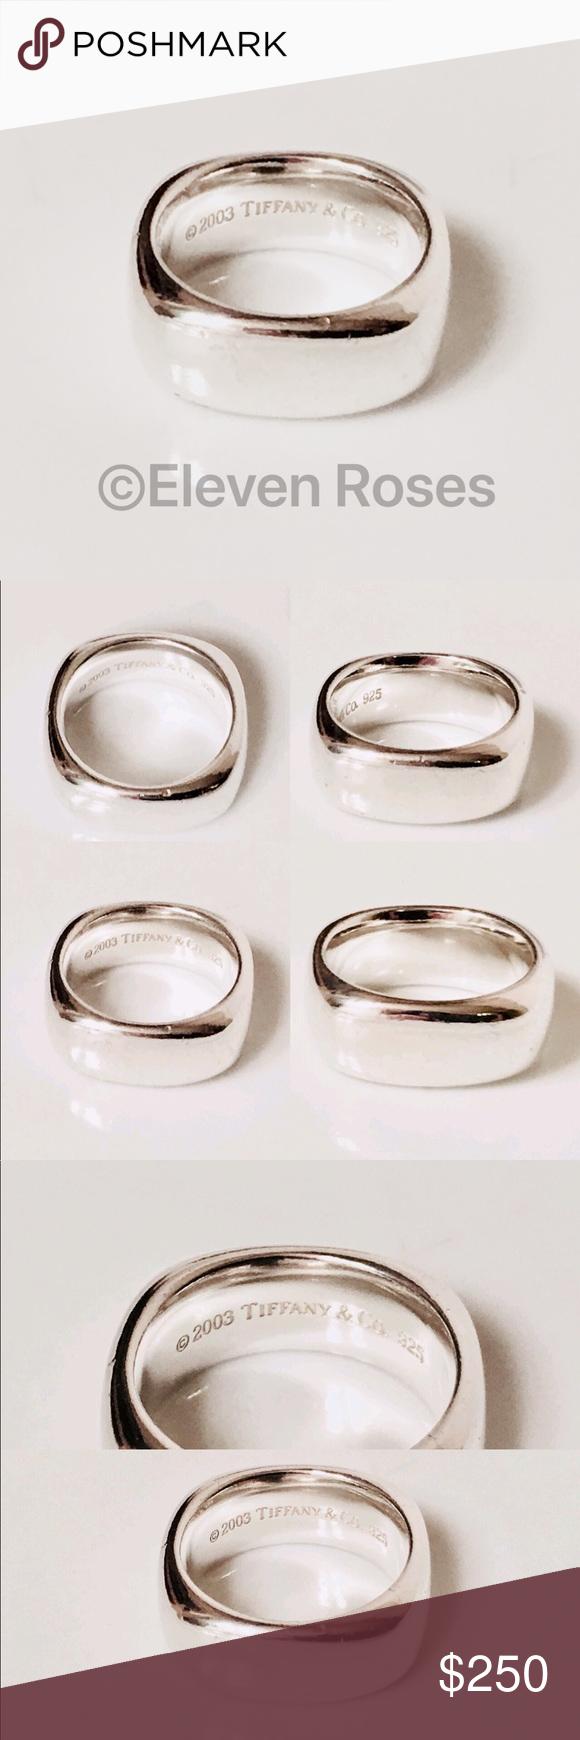 7f72ffaa2 Square Cushion Band Ring Tiffany & Co. Square Cushion Band Ring - 925  Sterling Silver - US Size 6 - Preowned W/ Lite Wear - Includes Tiffany  Pouch ...